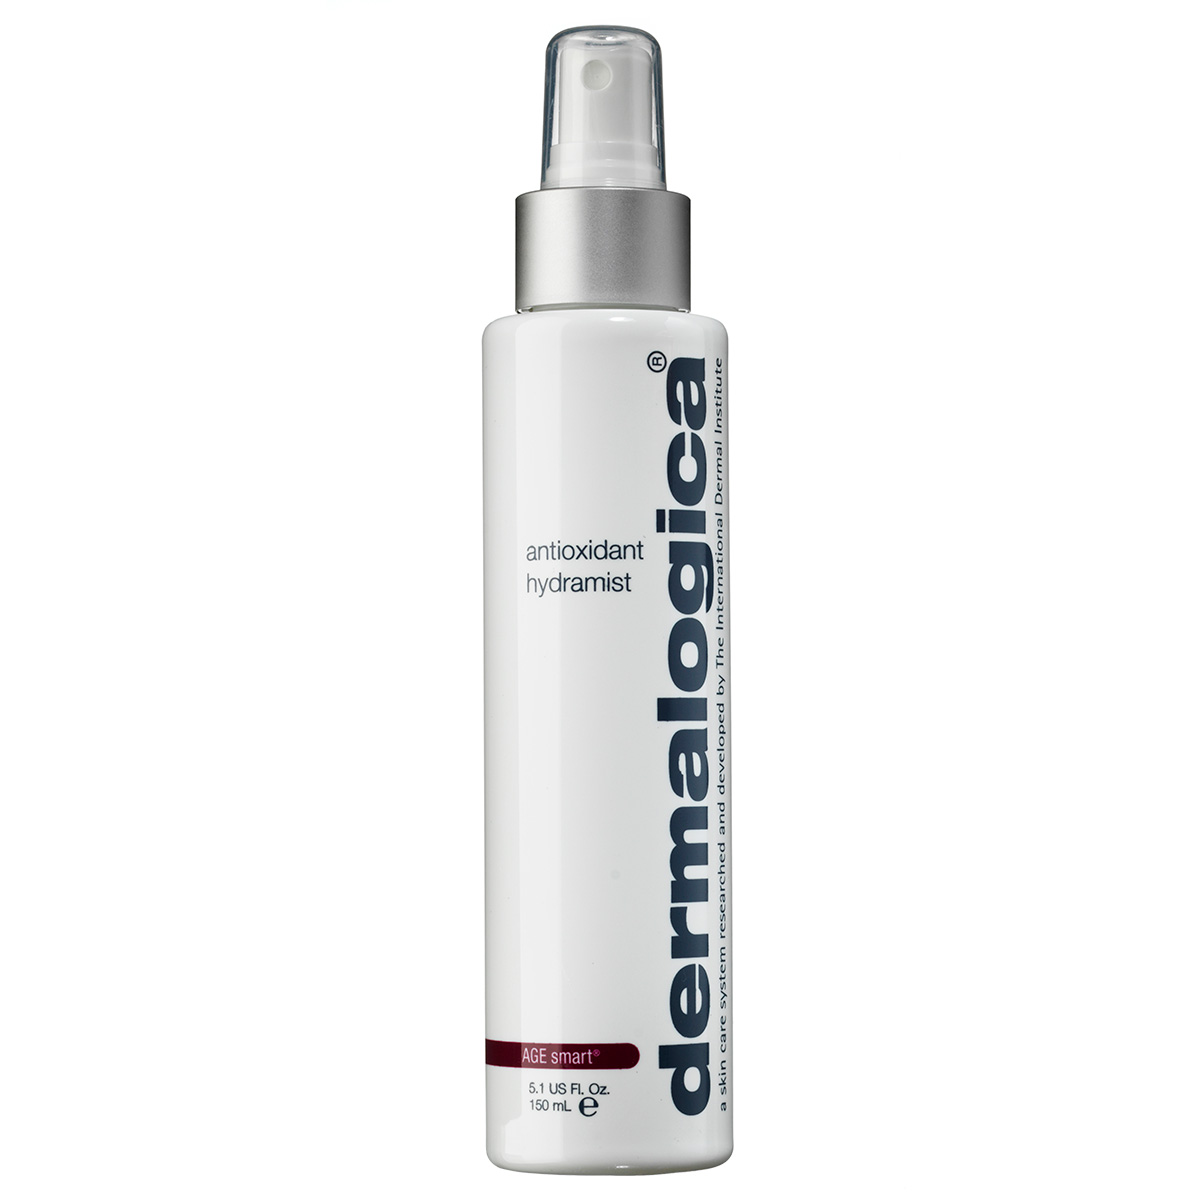 dermalogica - Antioxidant Hydramist Face Spray 150 ml